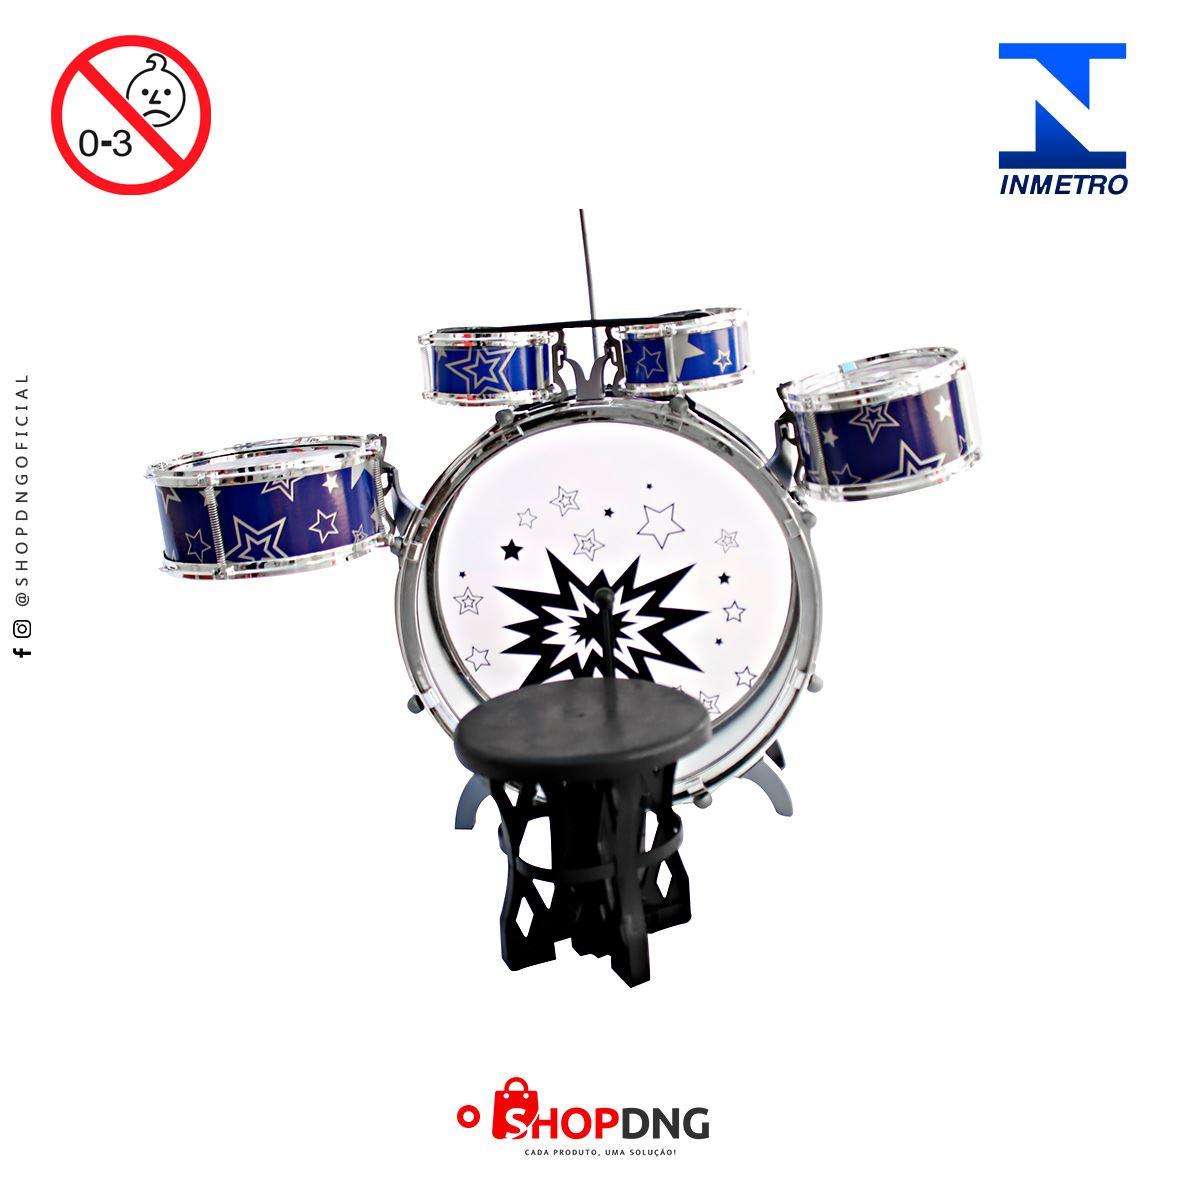 Bateria Infantil Rock Star com banco Importway - BW039 - Azul